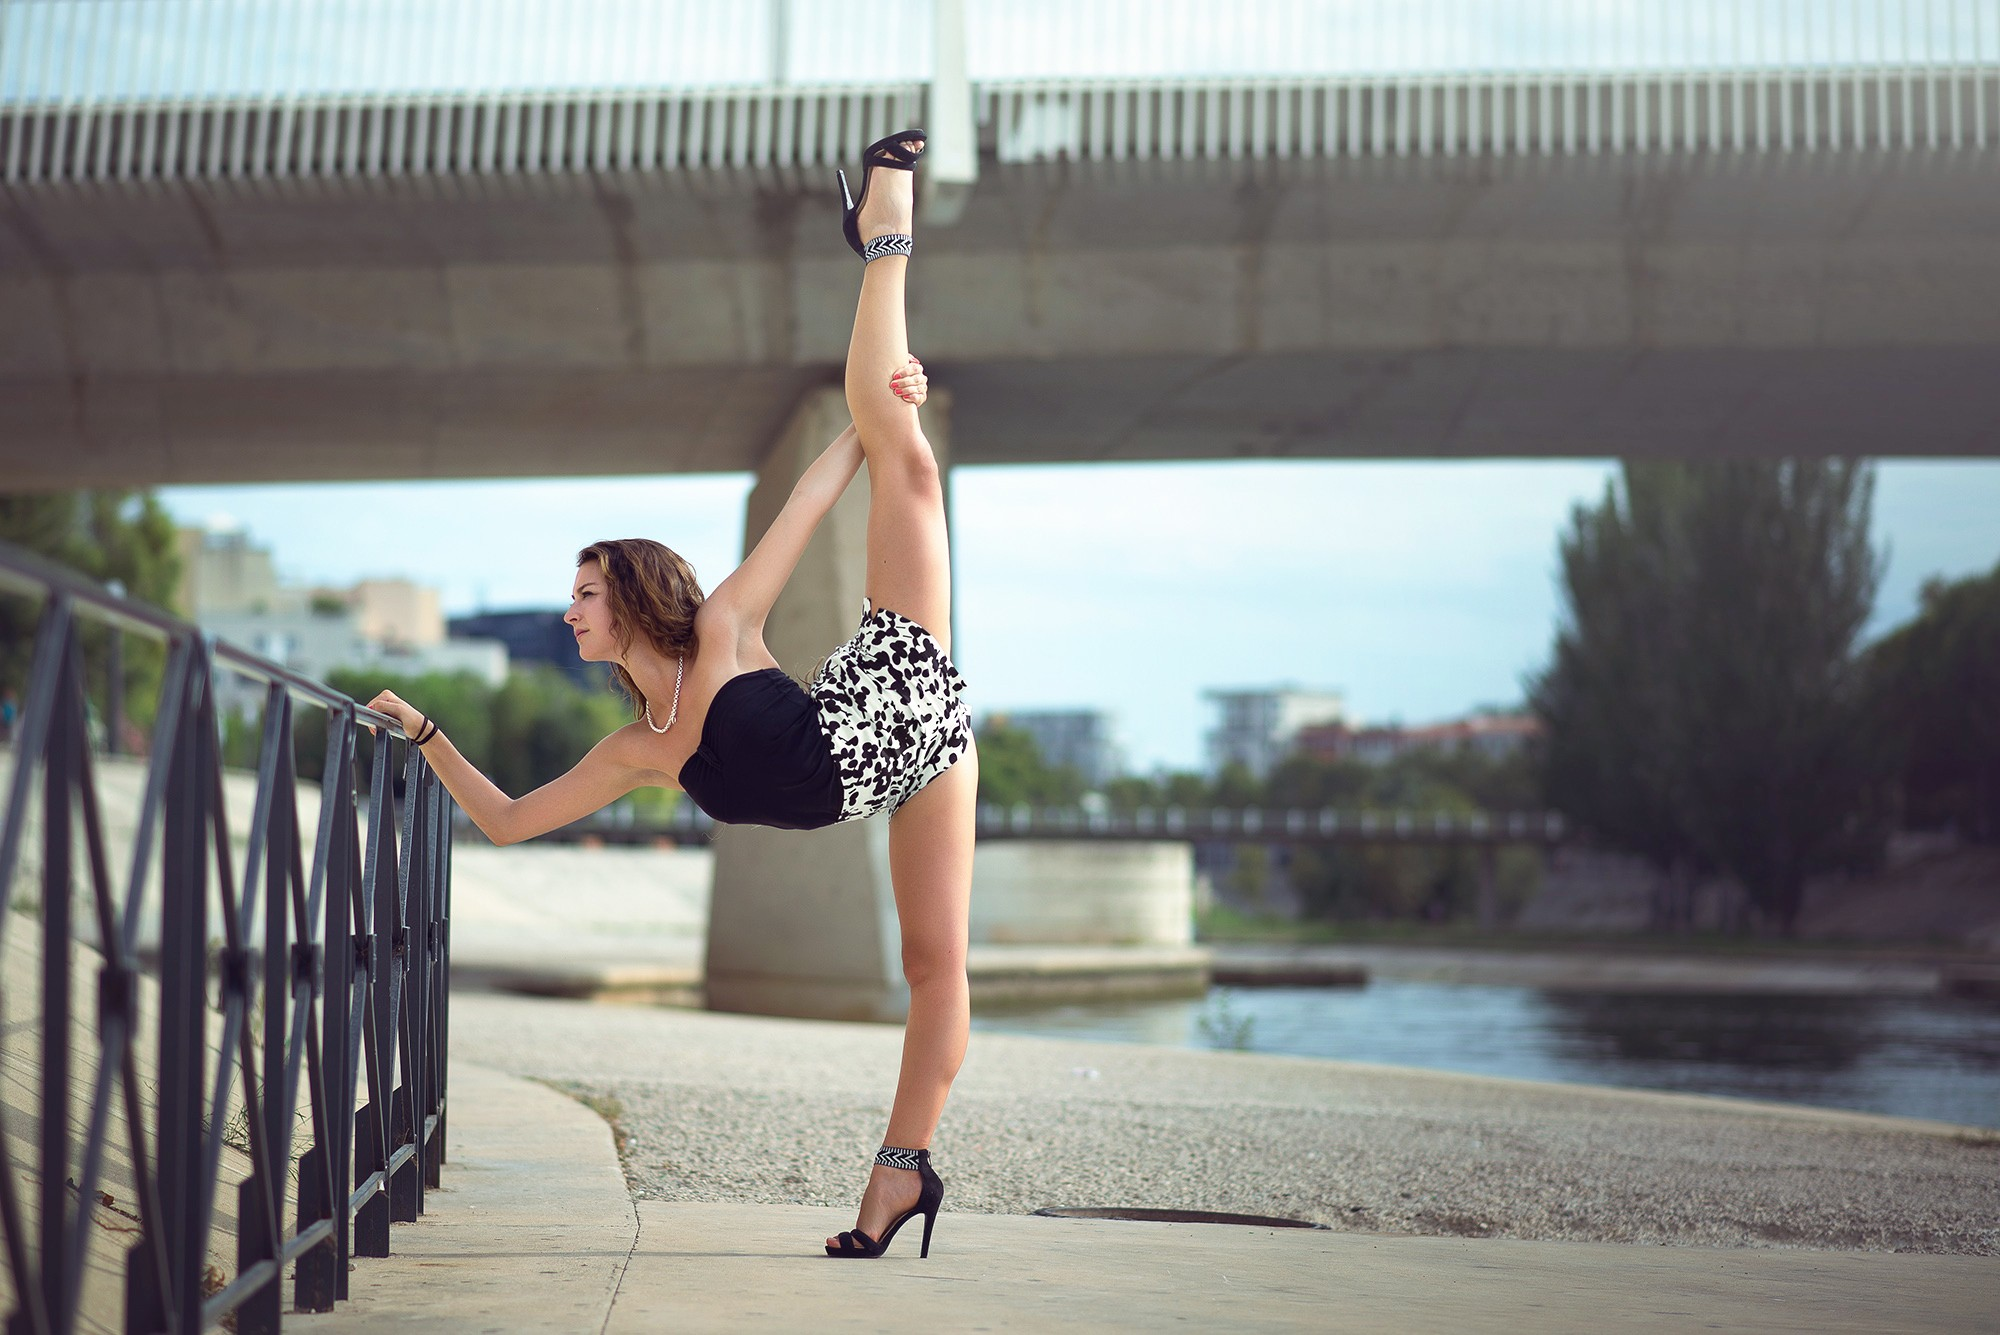 Fitness Girl Wallpaper Hd Gymnastics Hd Backgrounds Pixelstalk Net